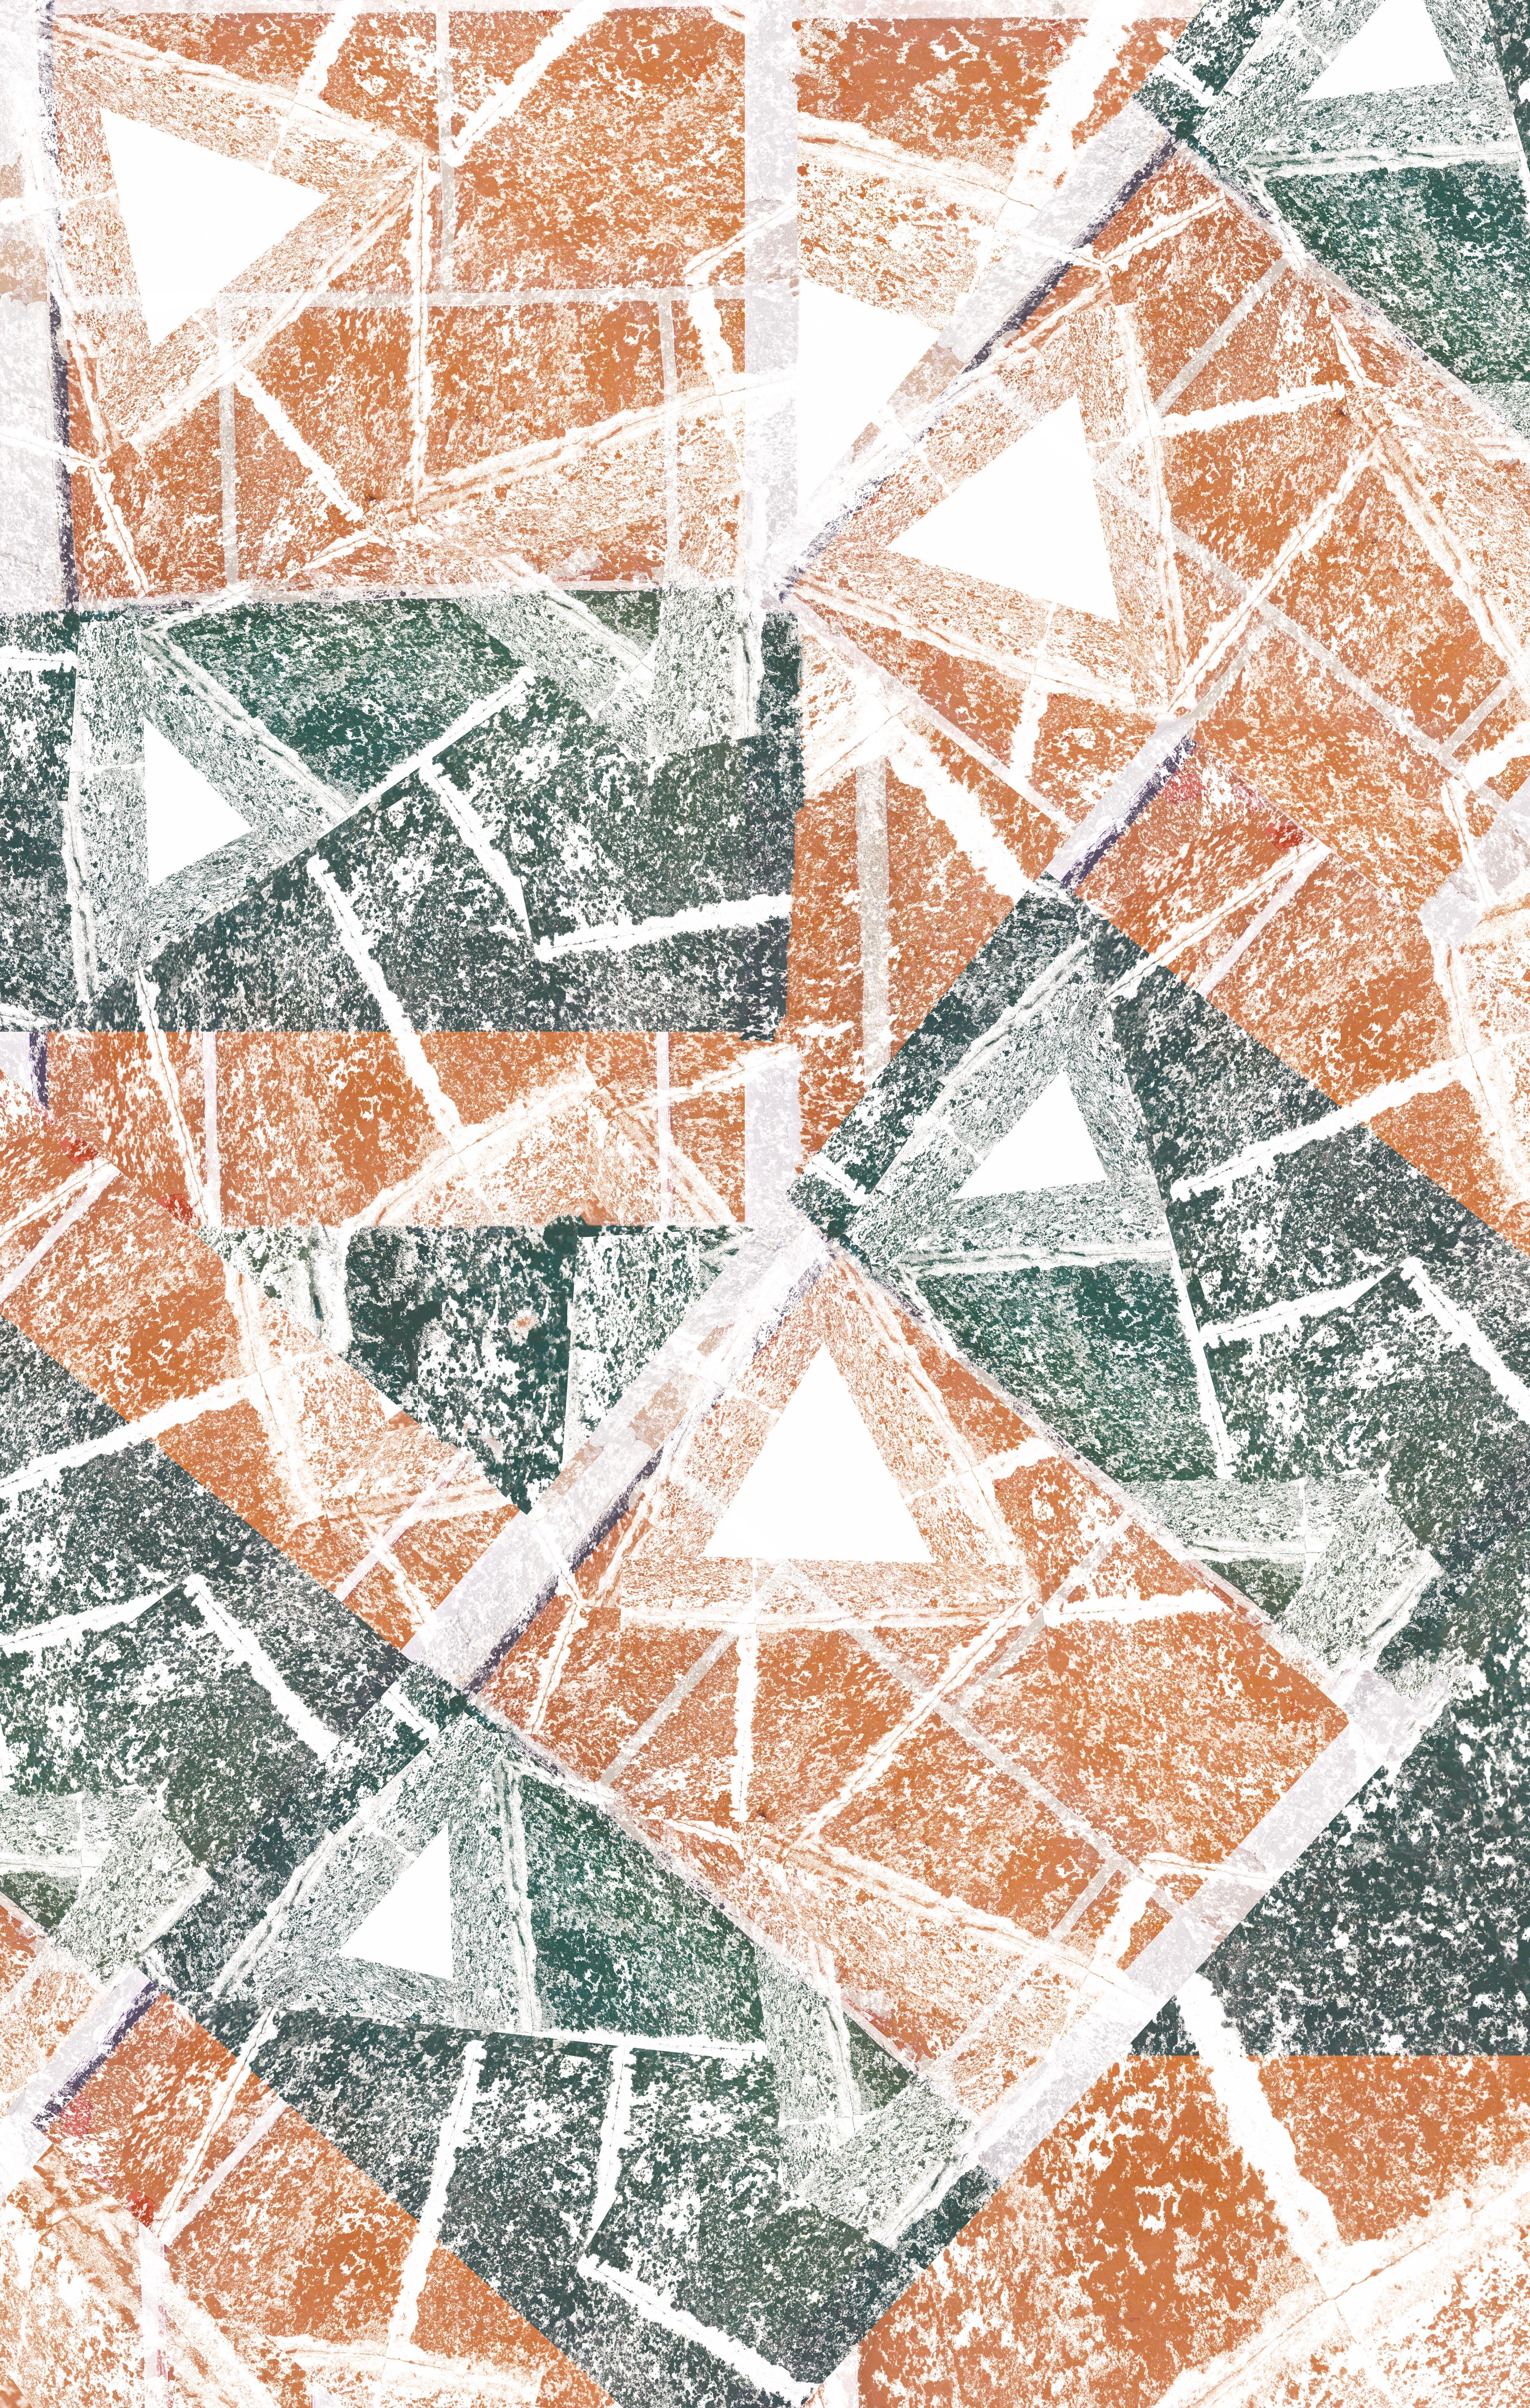 CUBA SCATTERD Textile Pattern Design